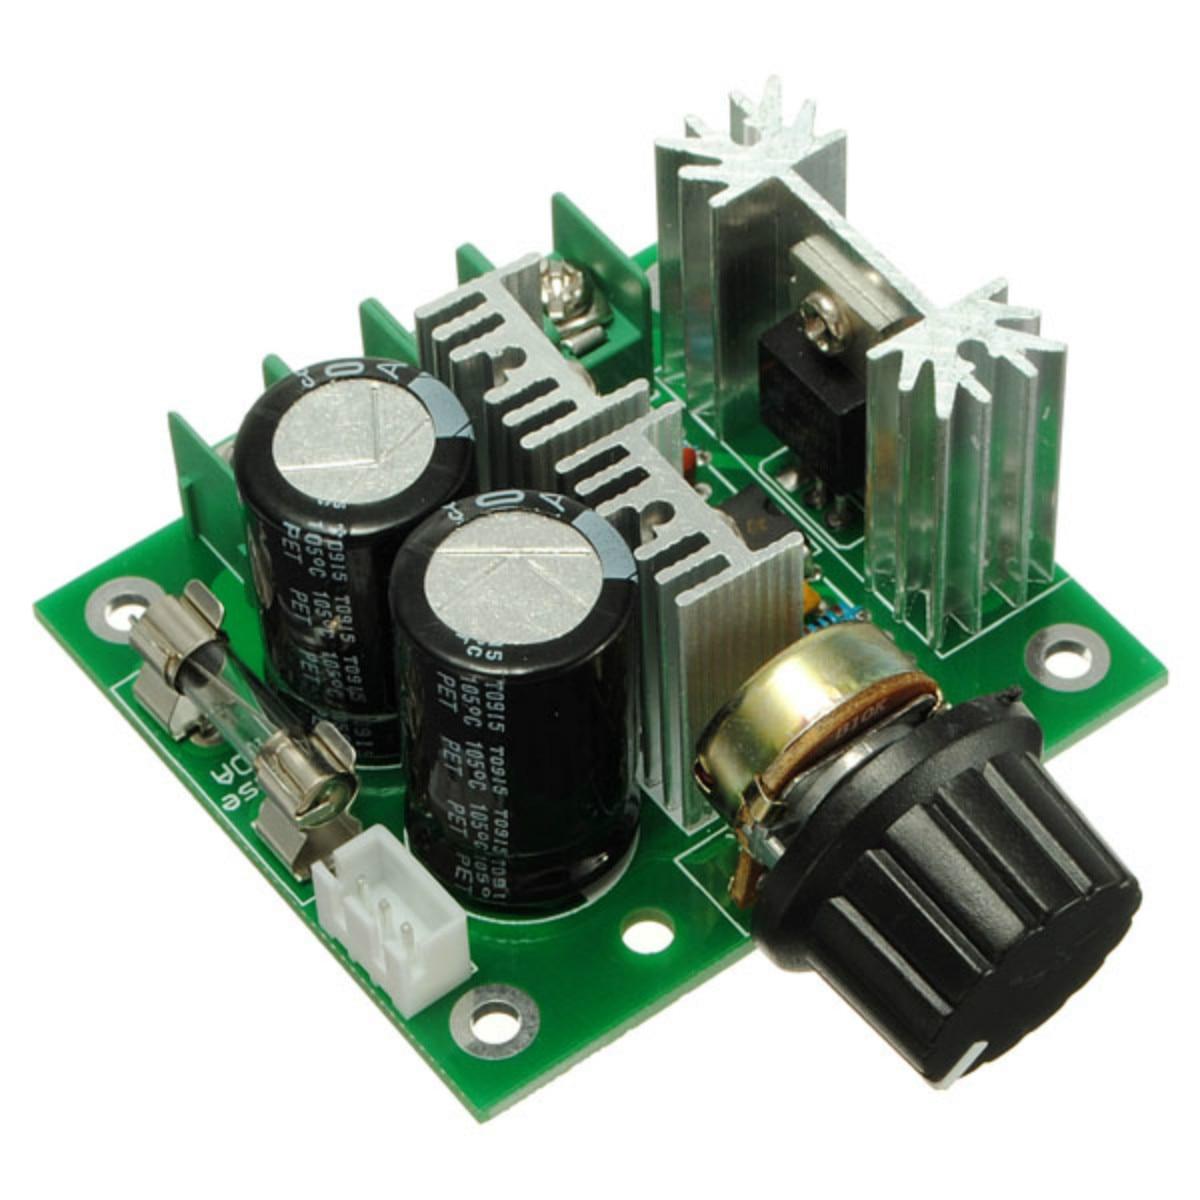 DC12V-40V 10A Motor Controller Modulation PWM DC Motor Speed Control Schalter Gouverneur